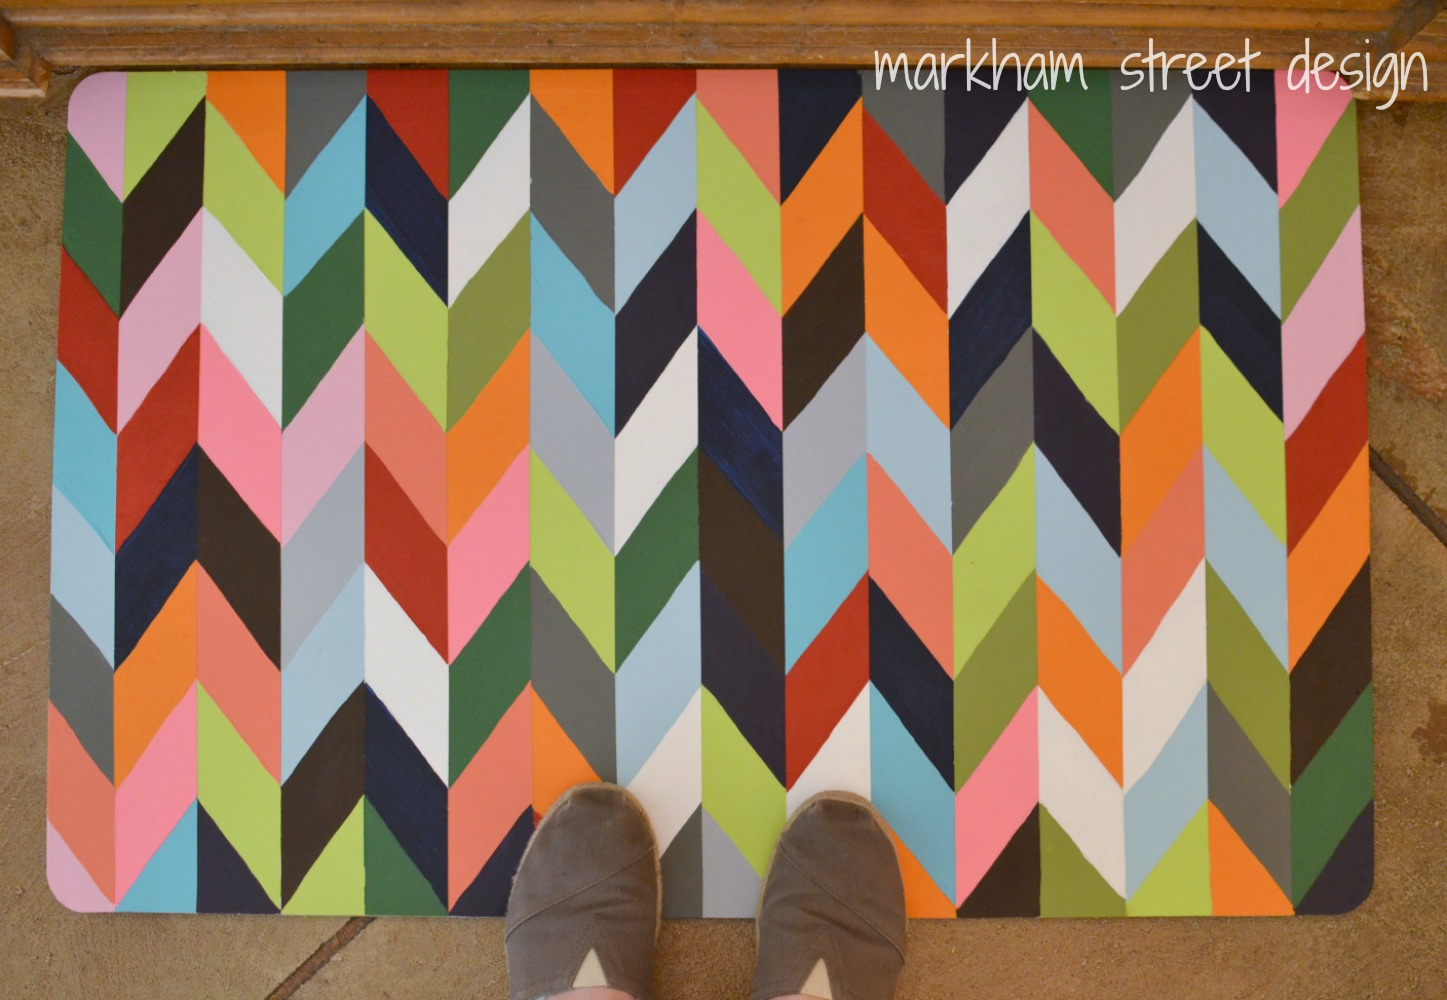 Charmant Chevron Painted Kitchen Mat